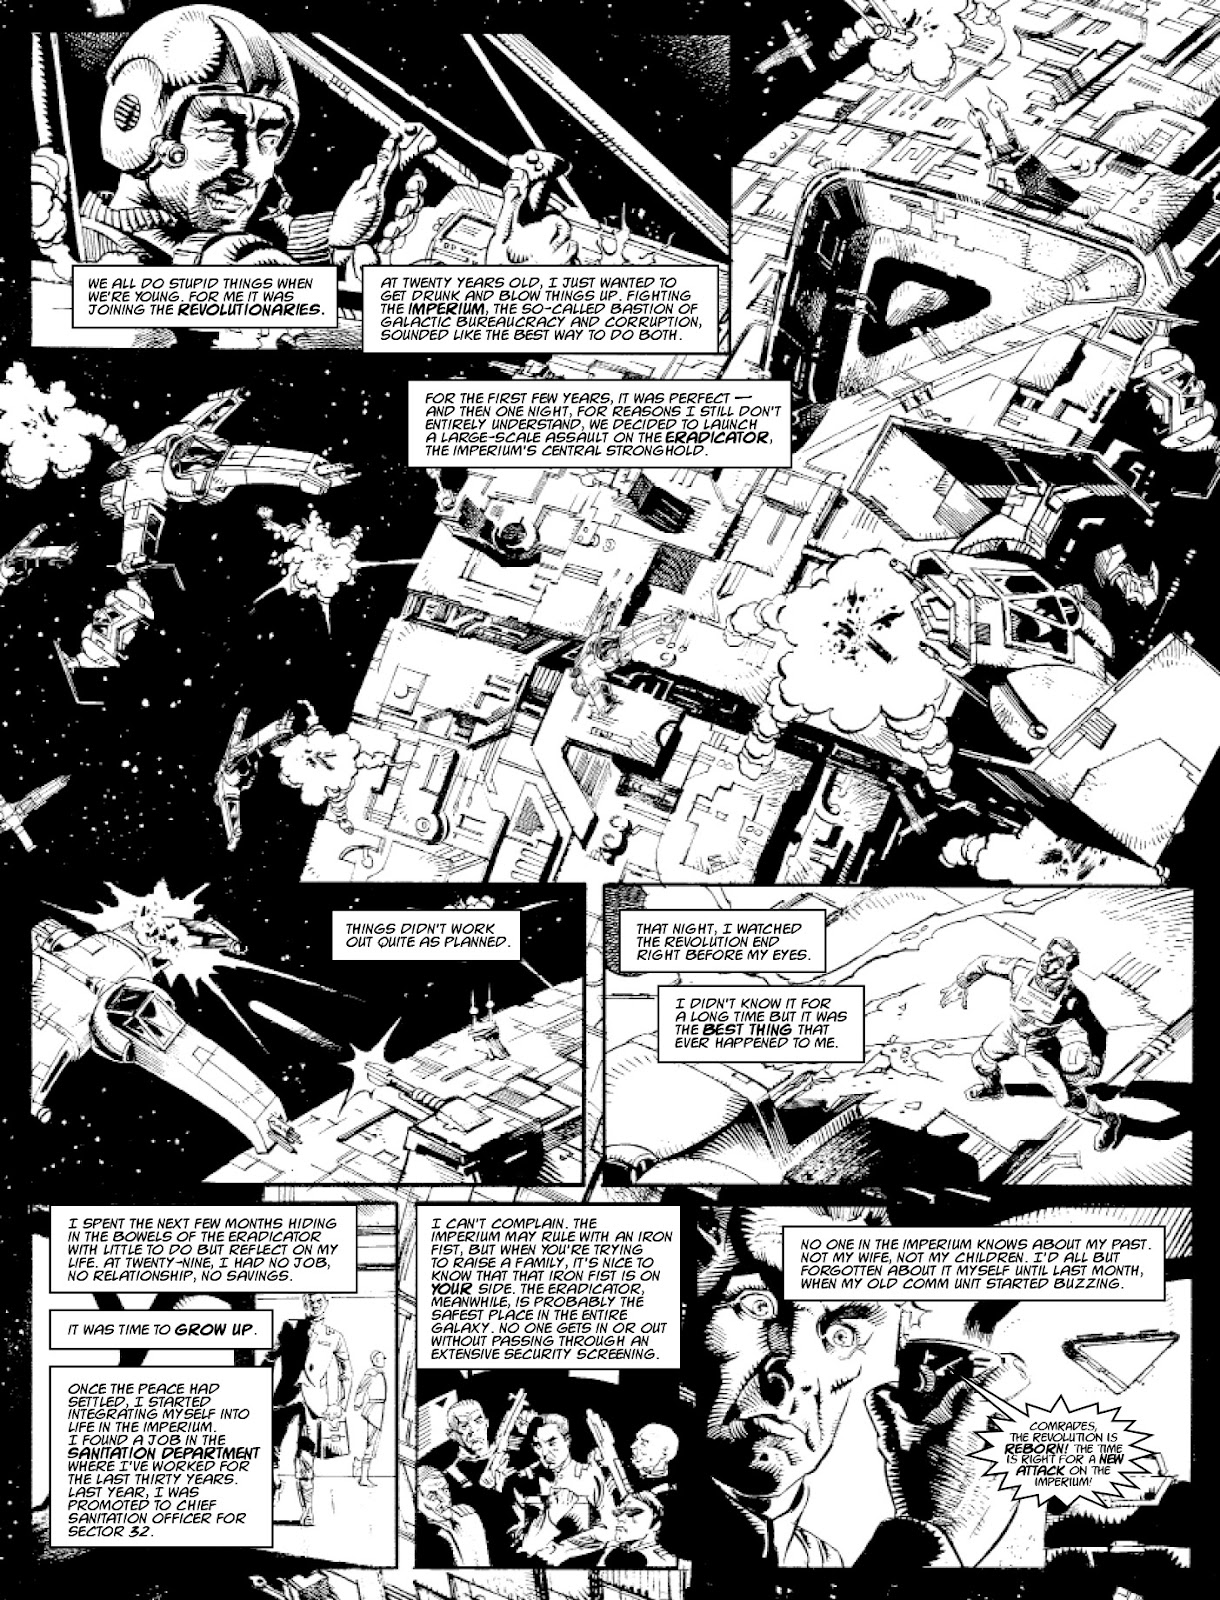 Judge Dredd Megazine (Vol. 5) issue 427 - Page 115